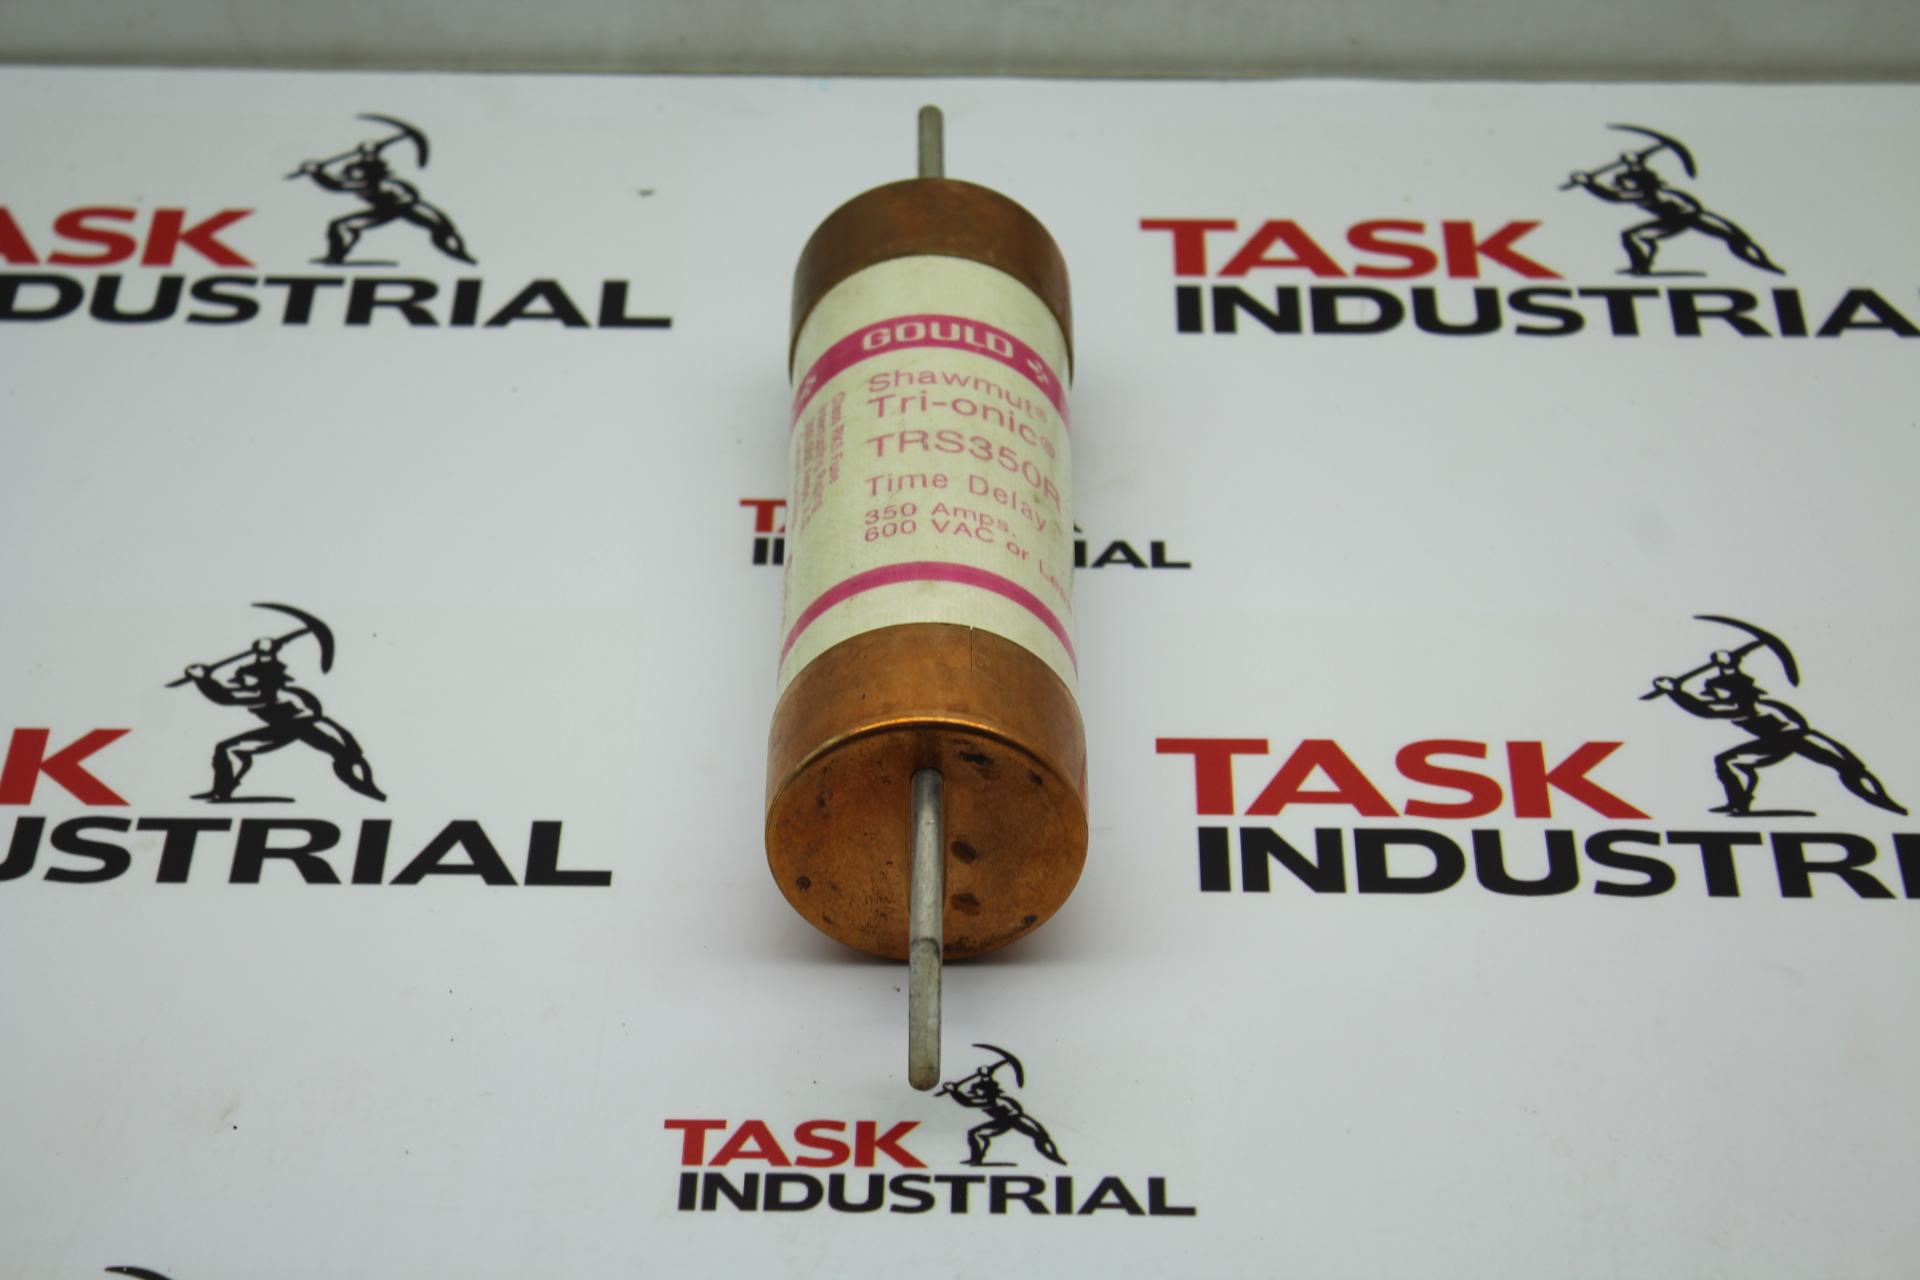 Gould Shawmut Tri-onic TRS350R Time Delay Fuse